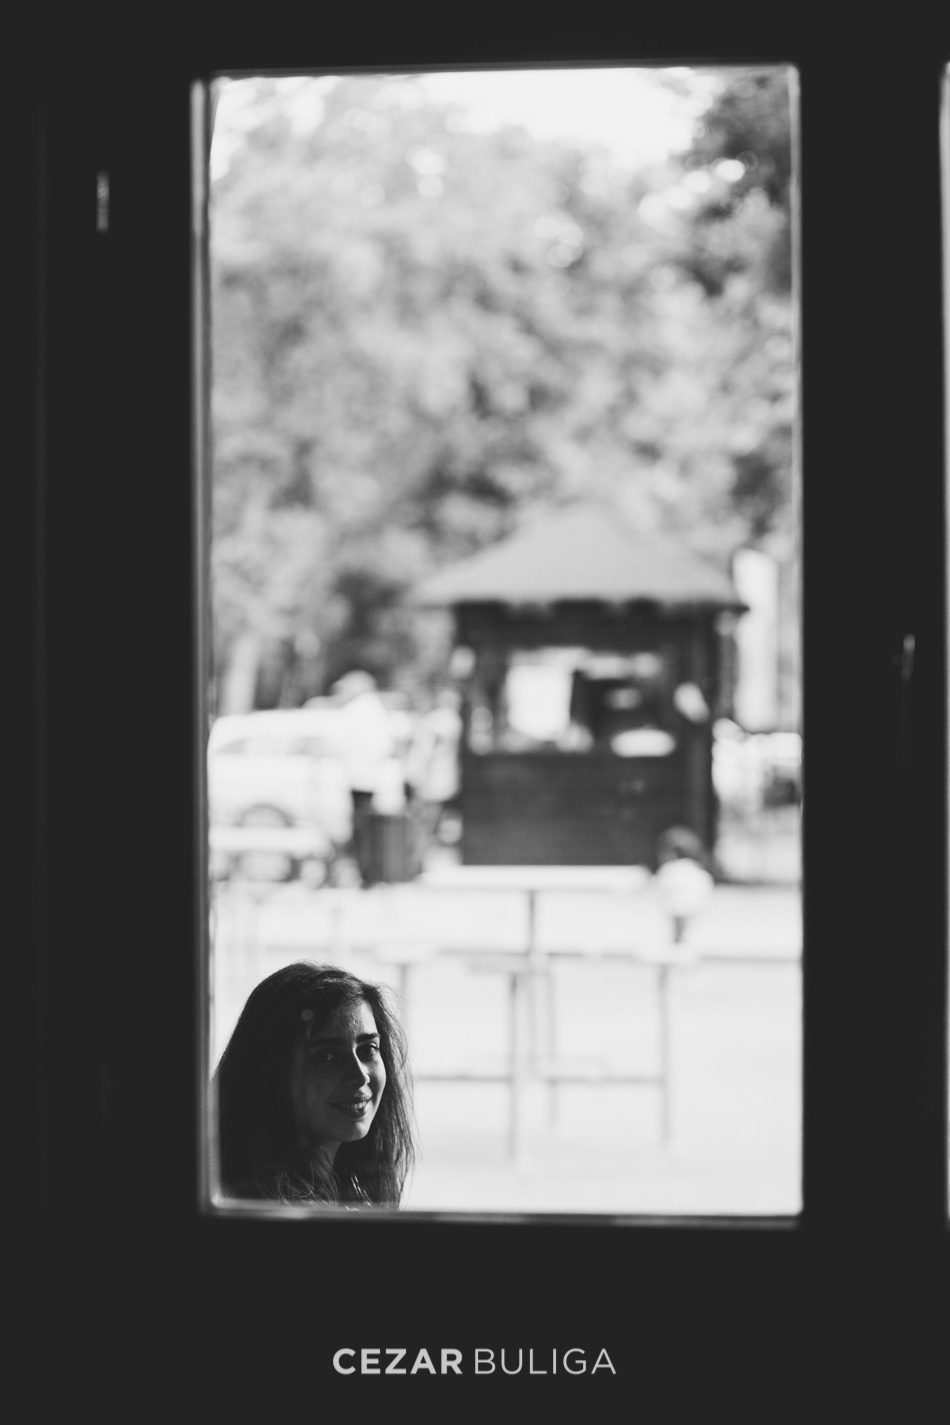 fotografie profesionala de familie platoul cornesti fotograf profesionist targu mures sedinta foto lejera artistica creativa cezar buliga